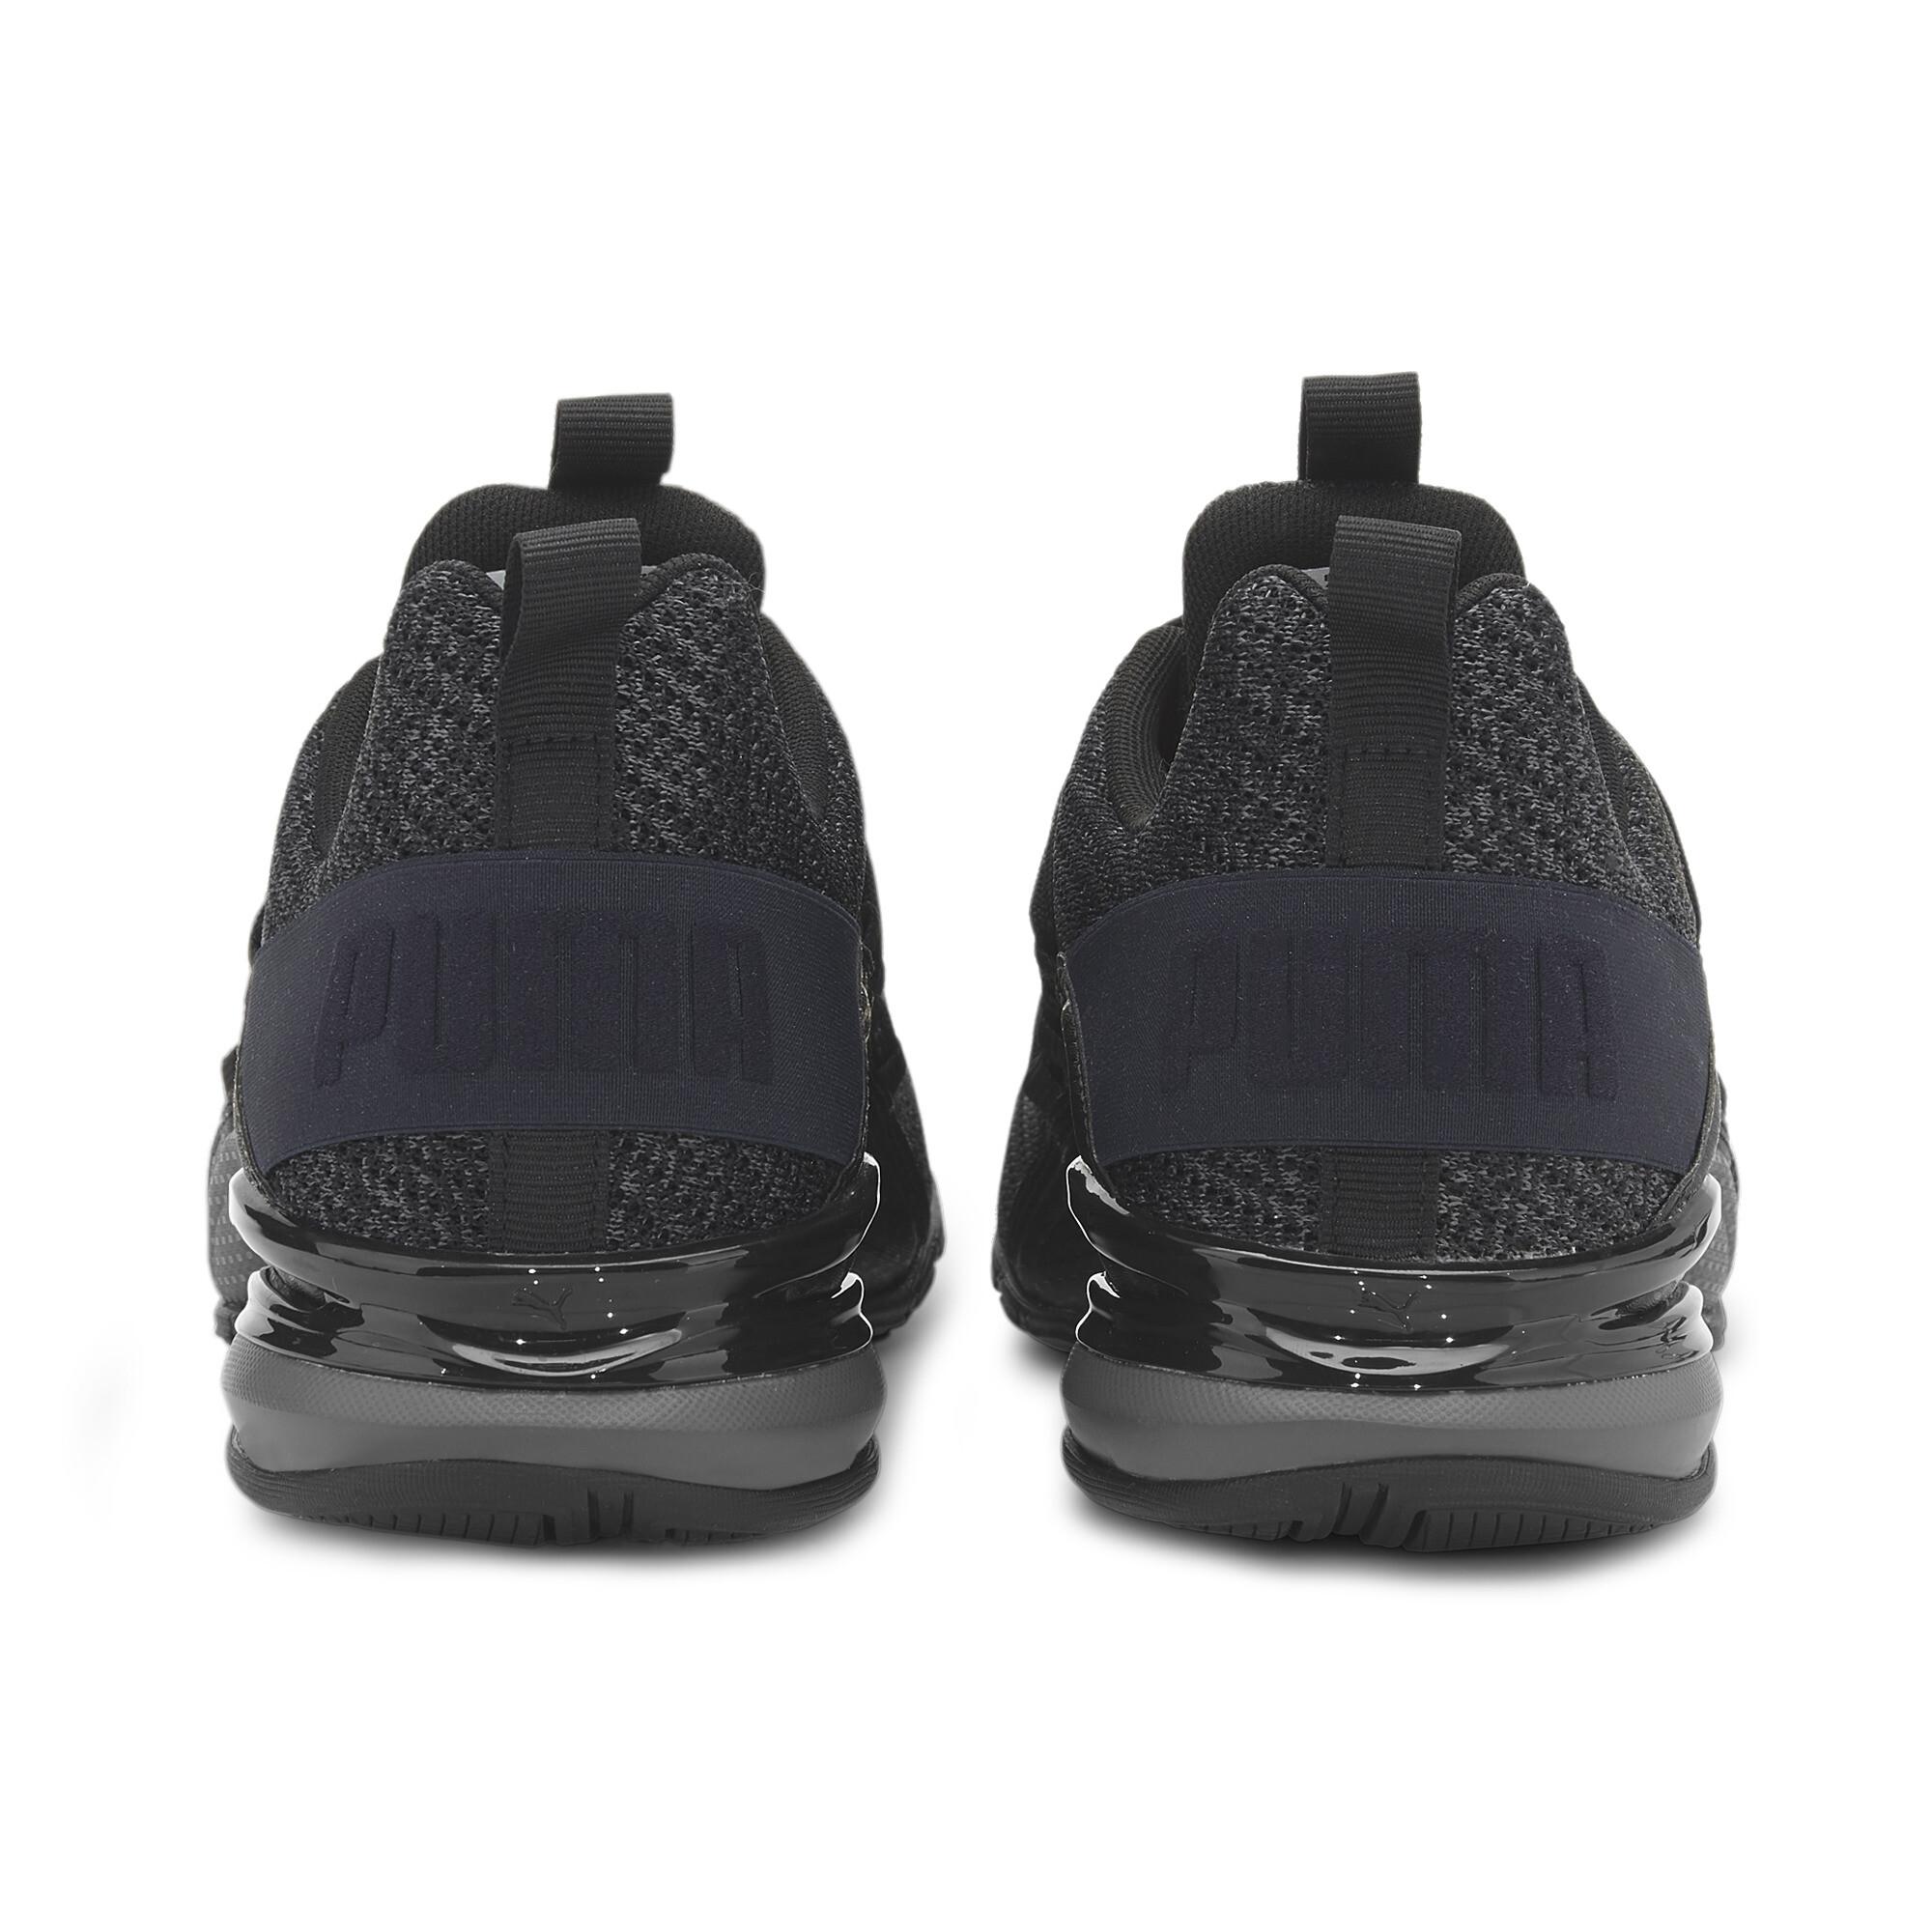 PUMA-Men-039-s-Axelion-Ultra-Running-Shoes thumbnail 22